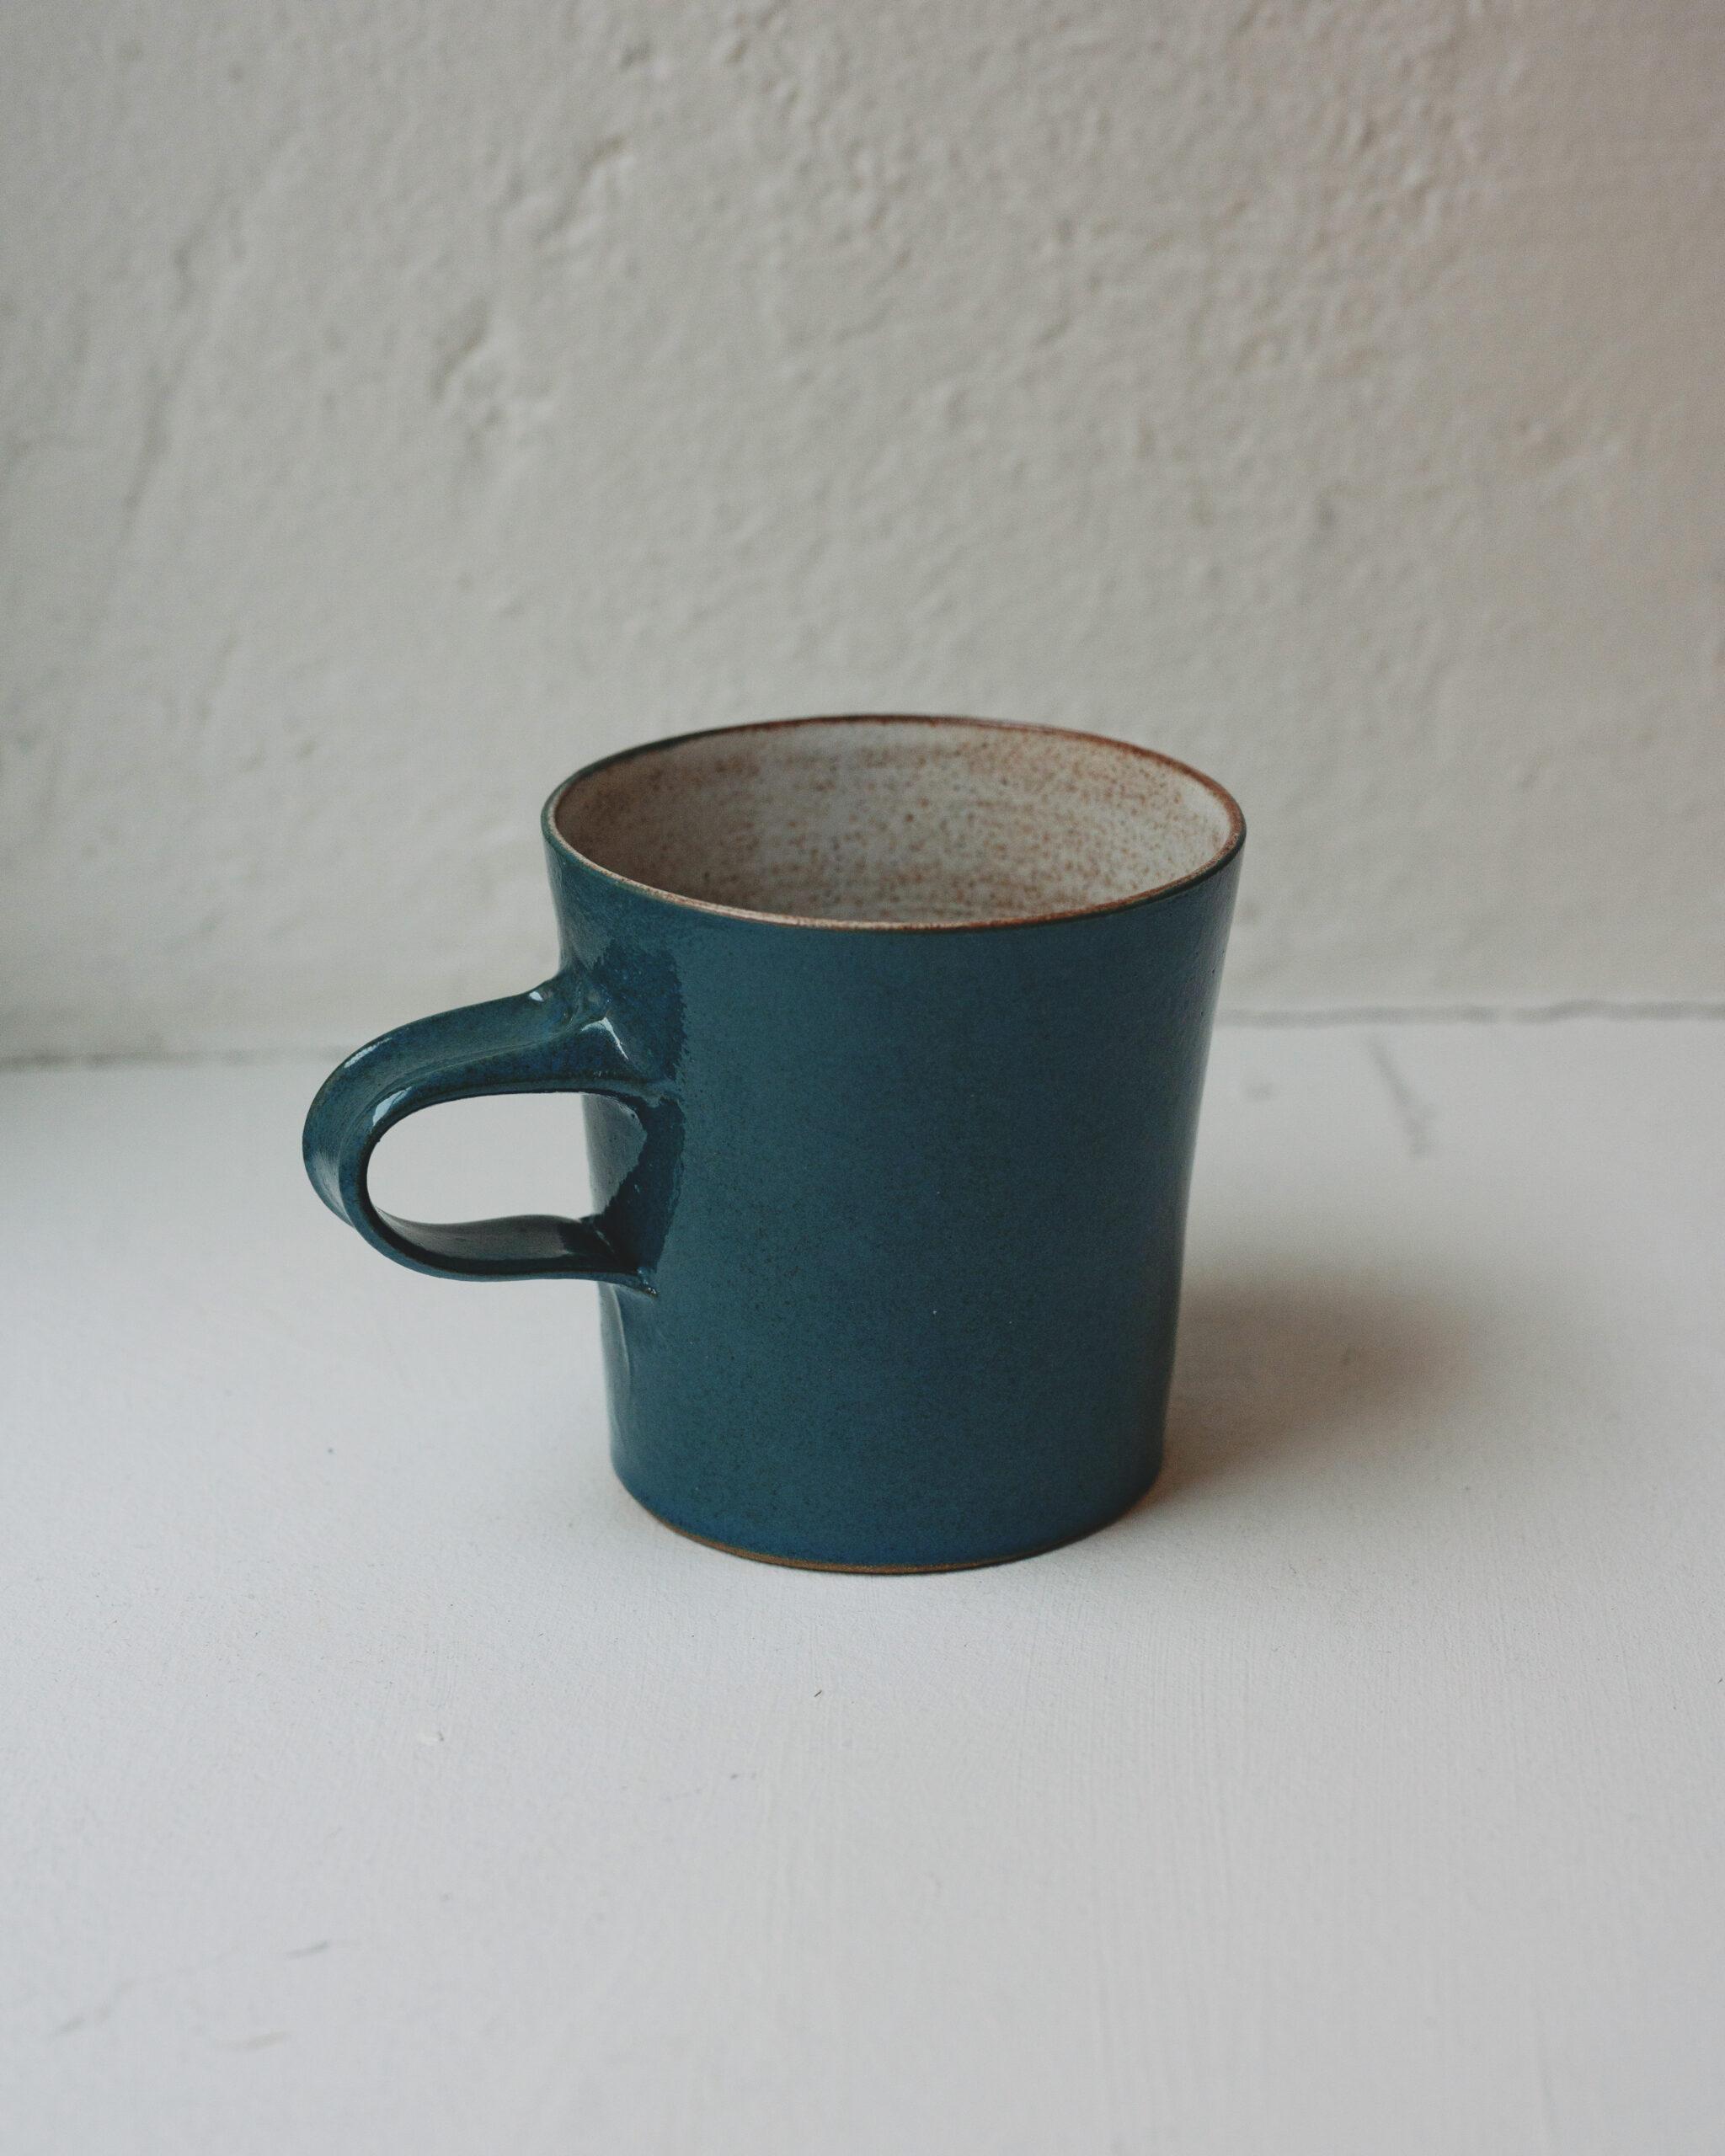 Kopp blågrön